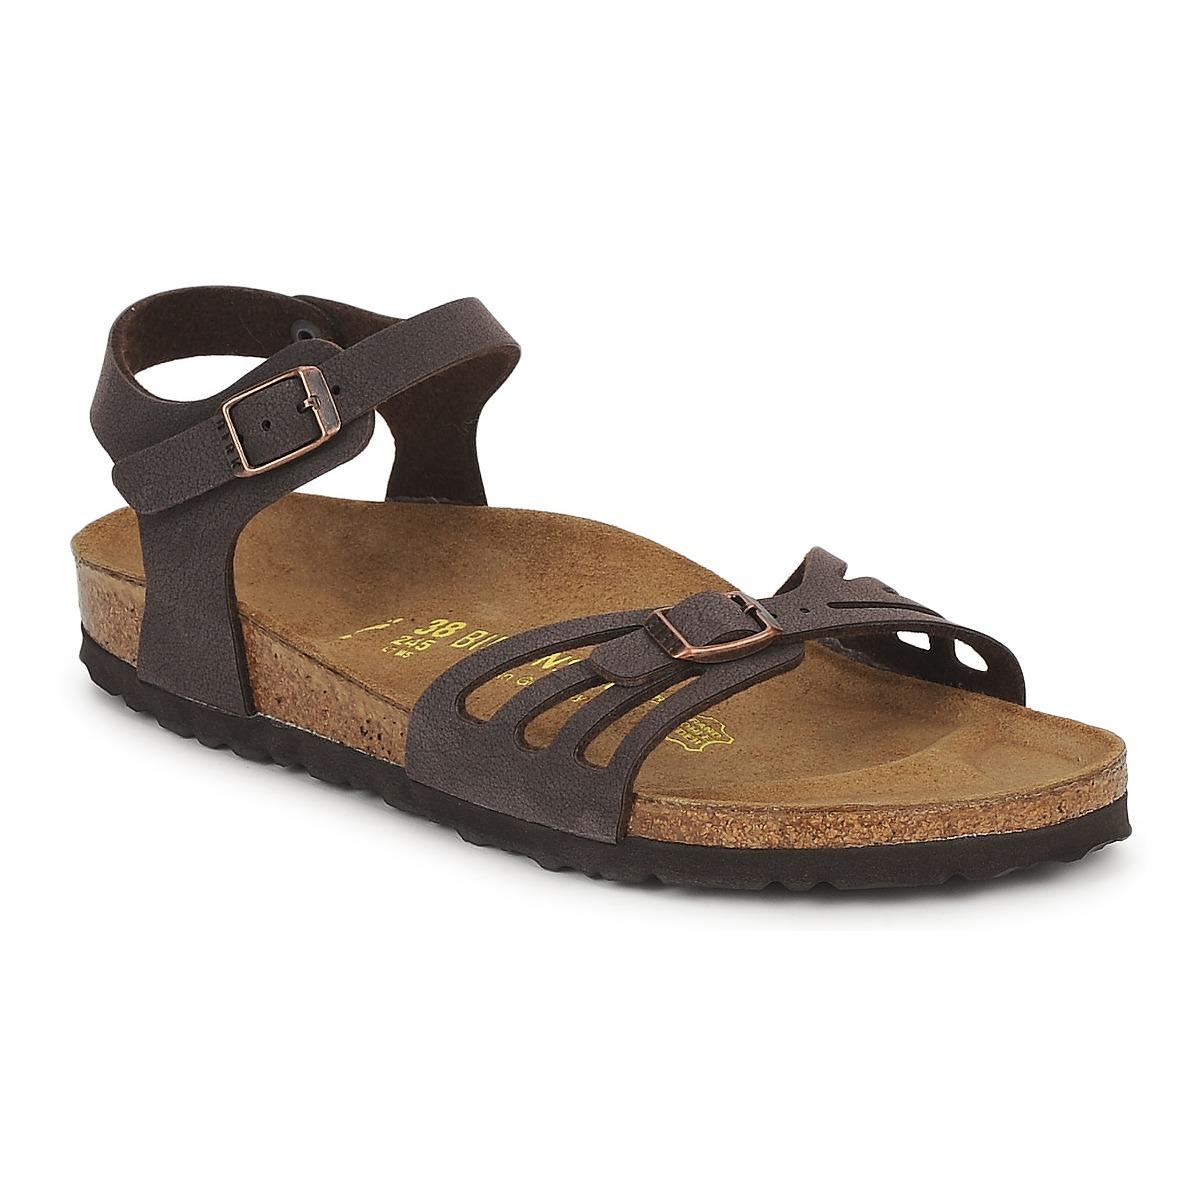 Sandale Birkenstock BALI Moka